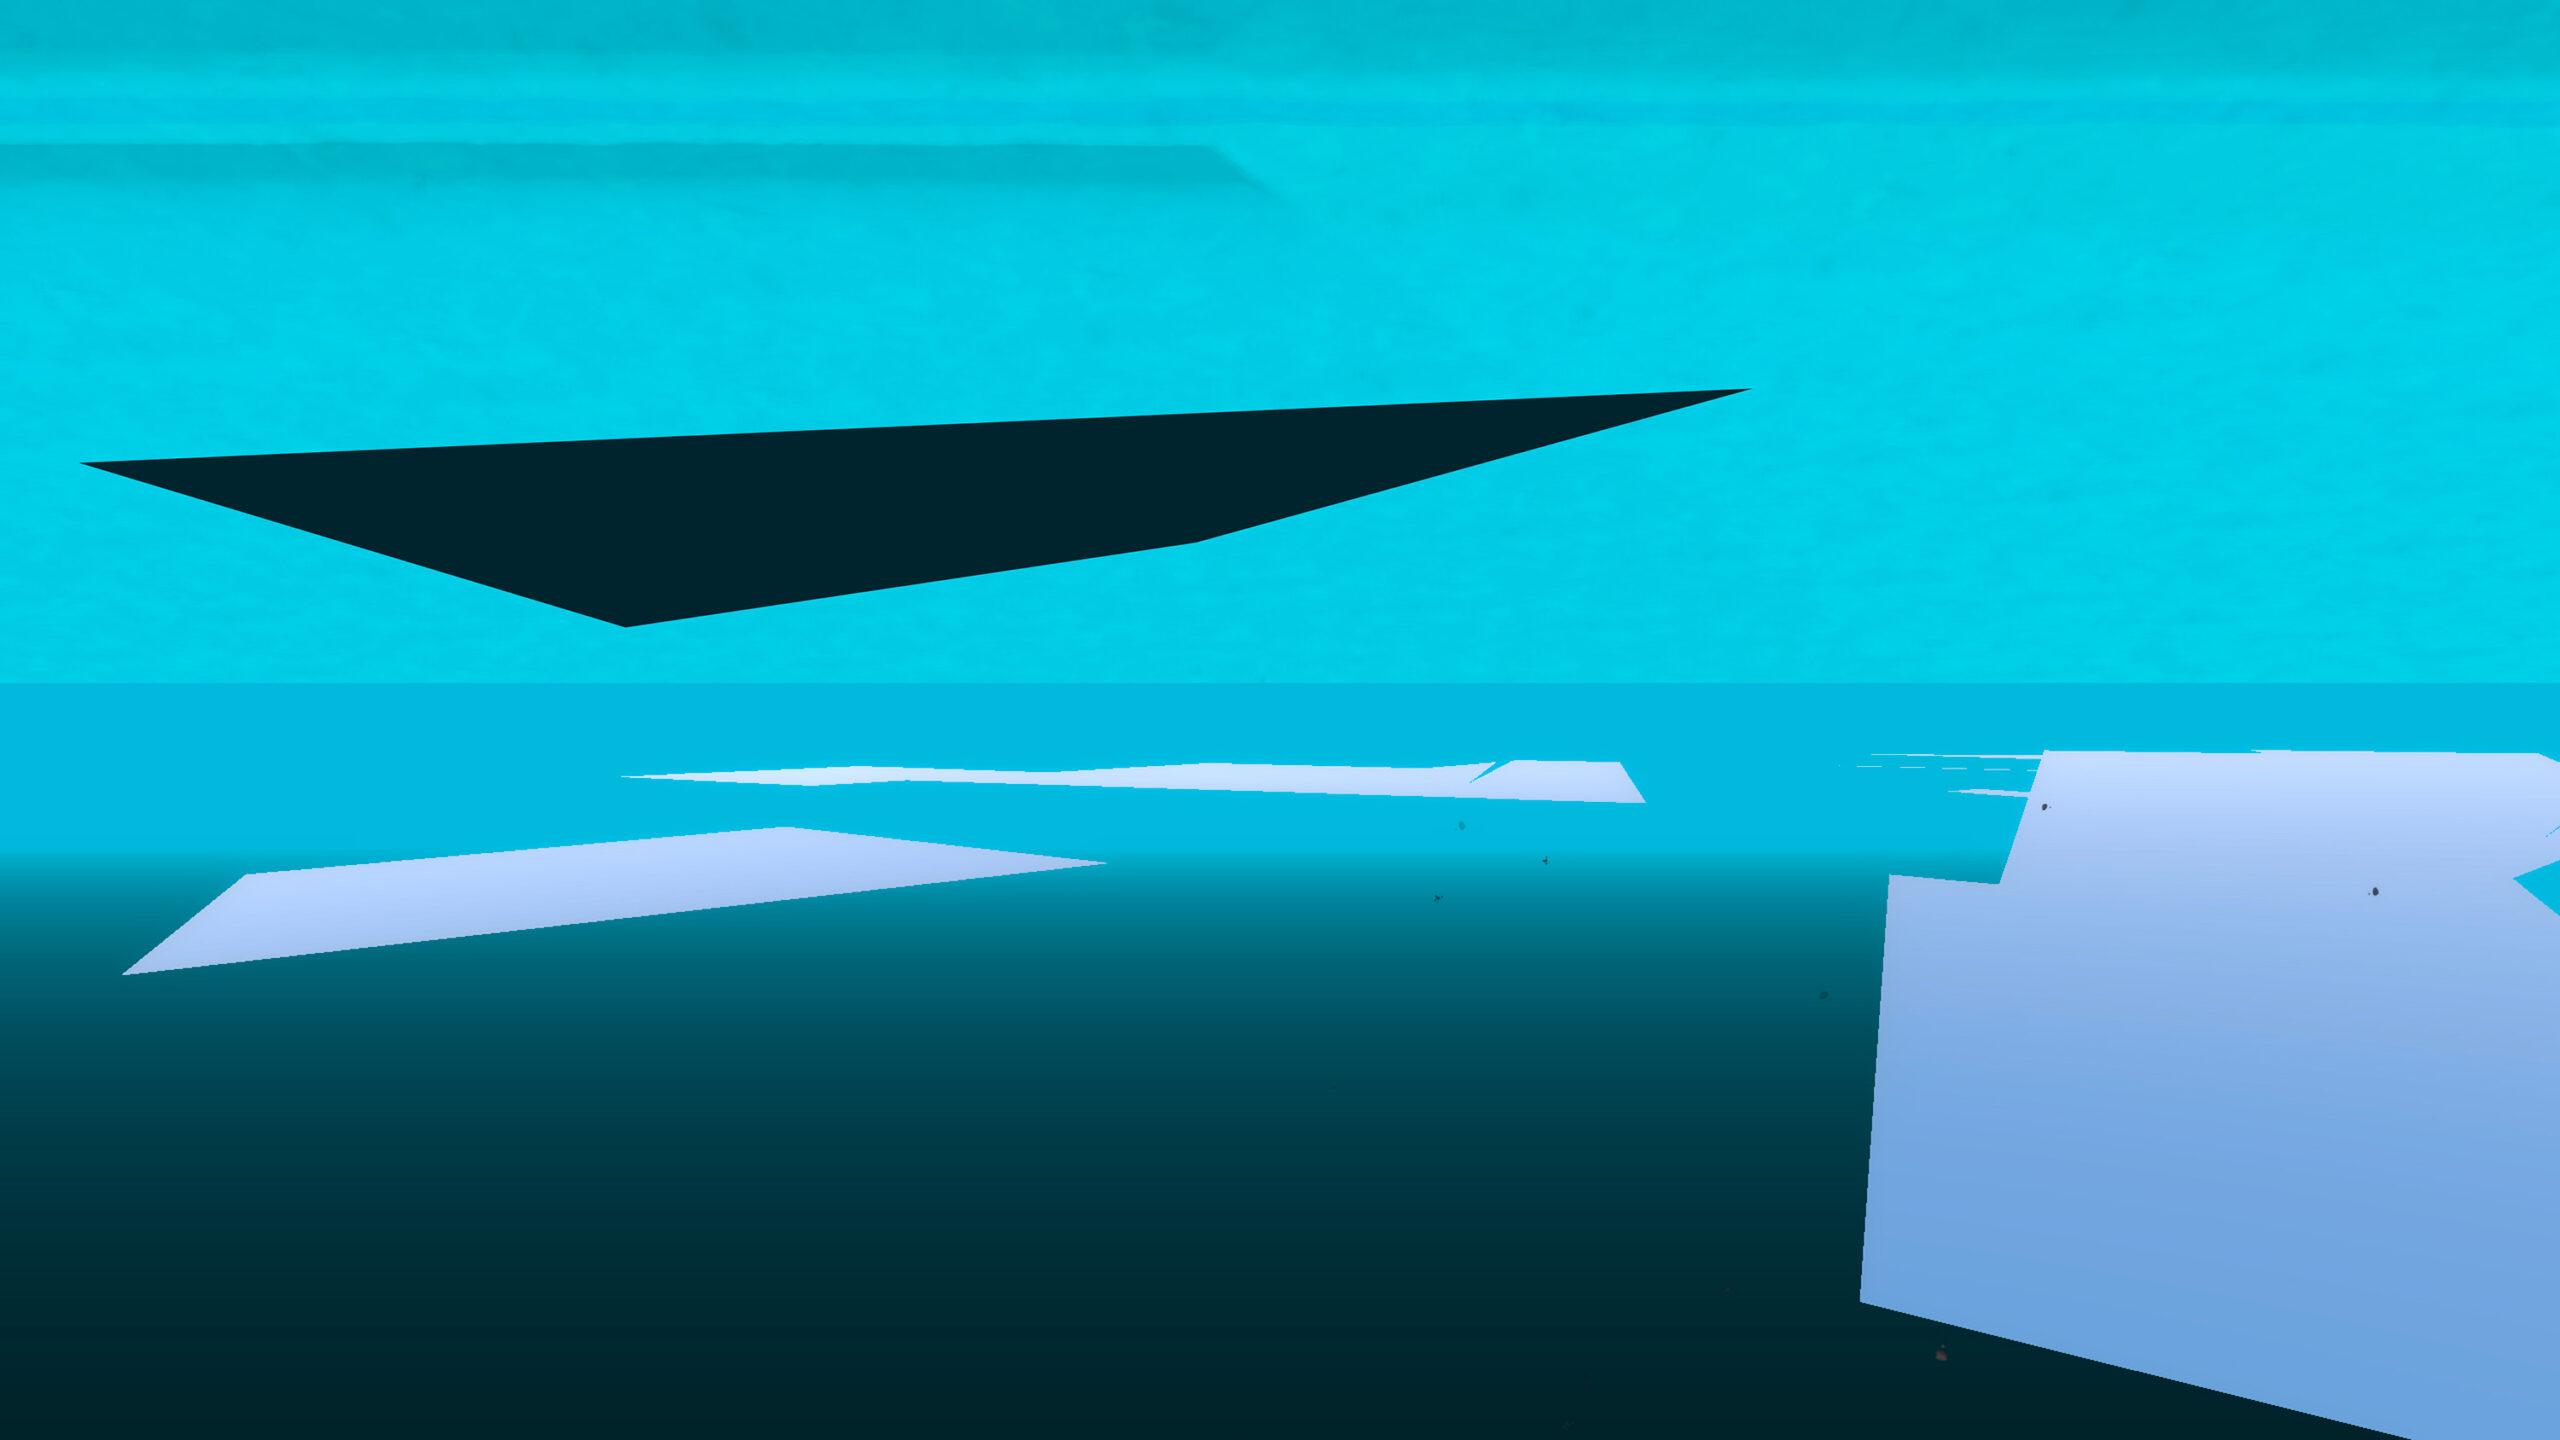 Ewa Doroszenko – Imagine yourself on an island in the middle of the ocean 03 - video